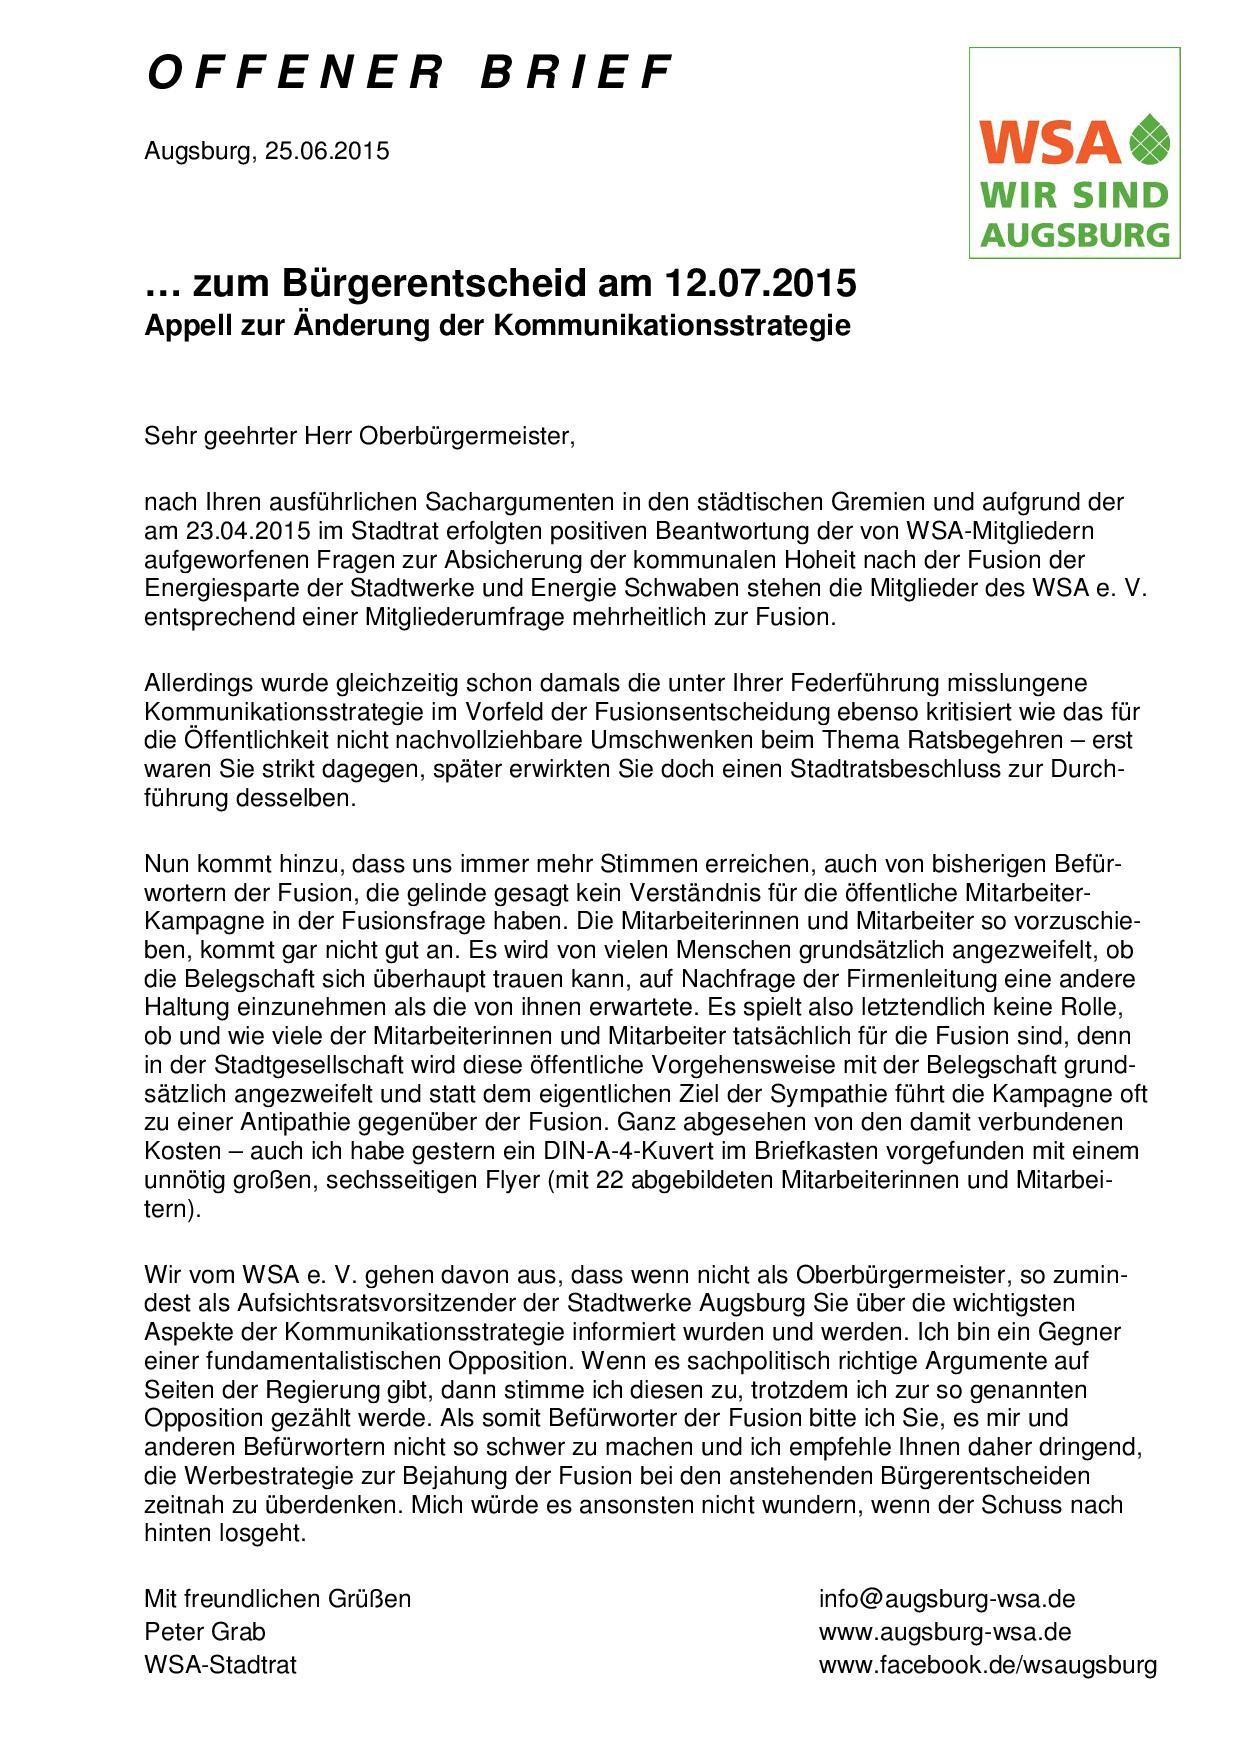 WSA zum Fusions-Bürgerentscheid - Offener Brief vom 25.06.2015 an Oberbürgermeister Dr. Kurt Gribl-001